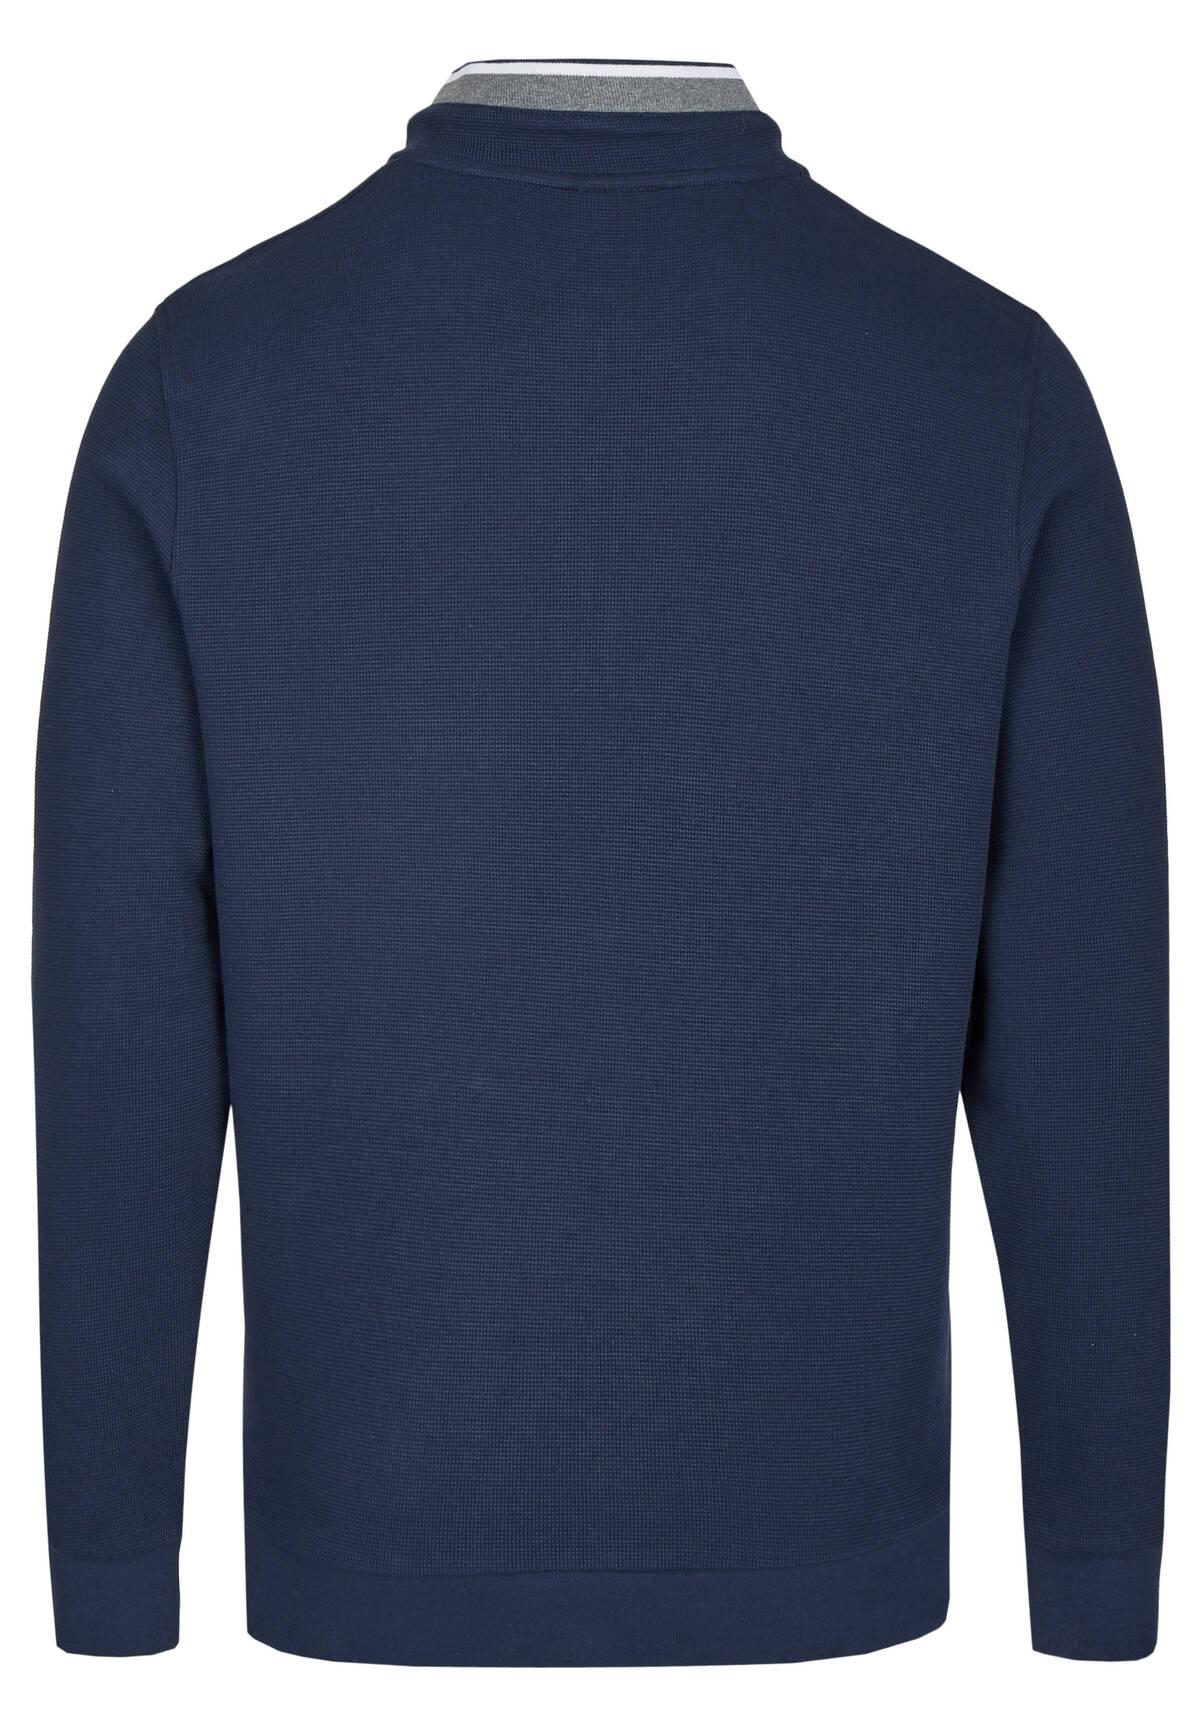 Sweat shirt en coton /